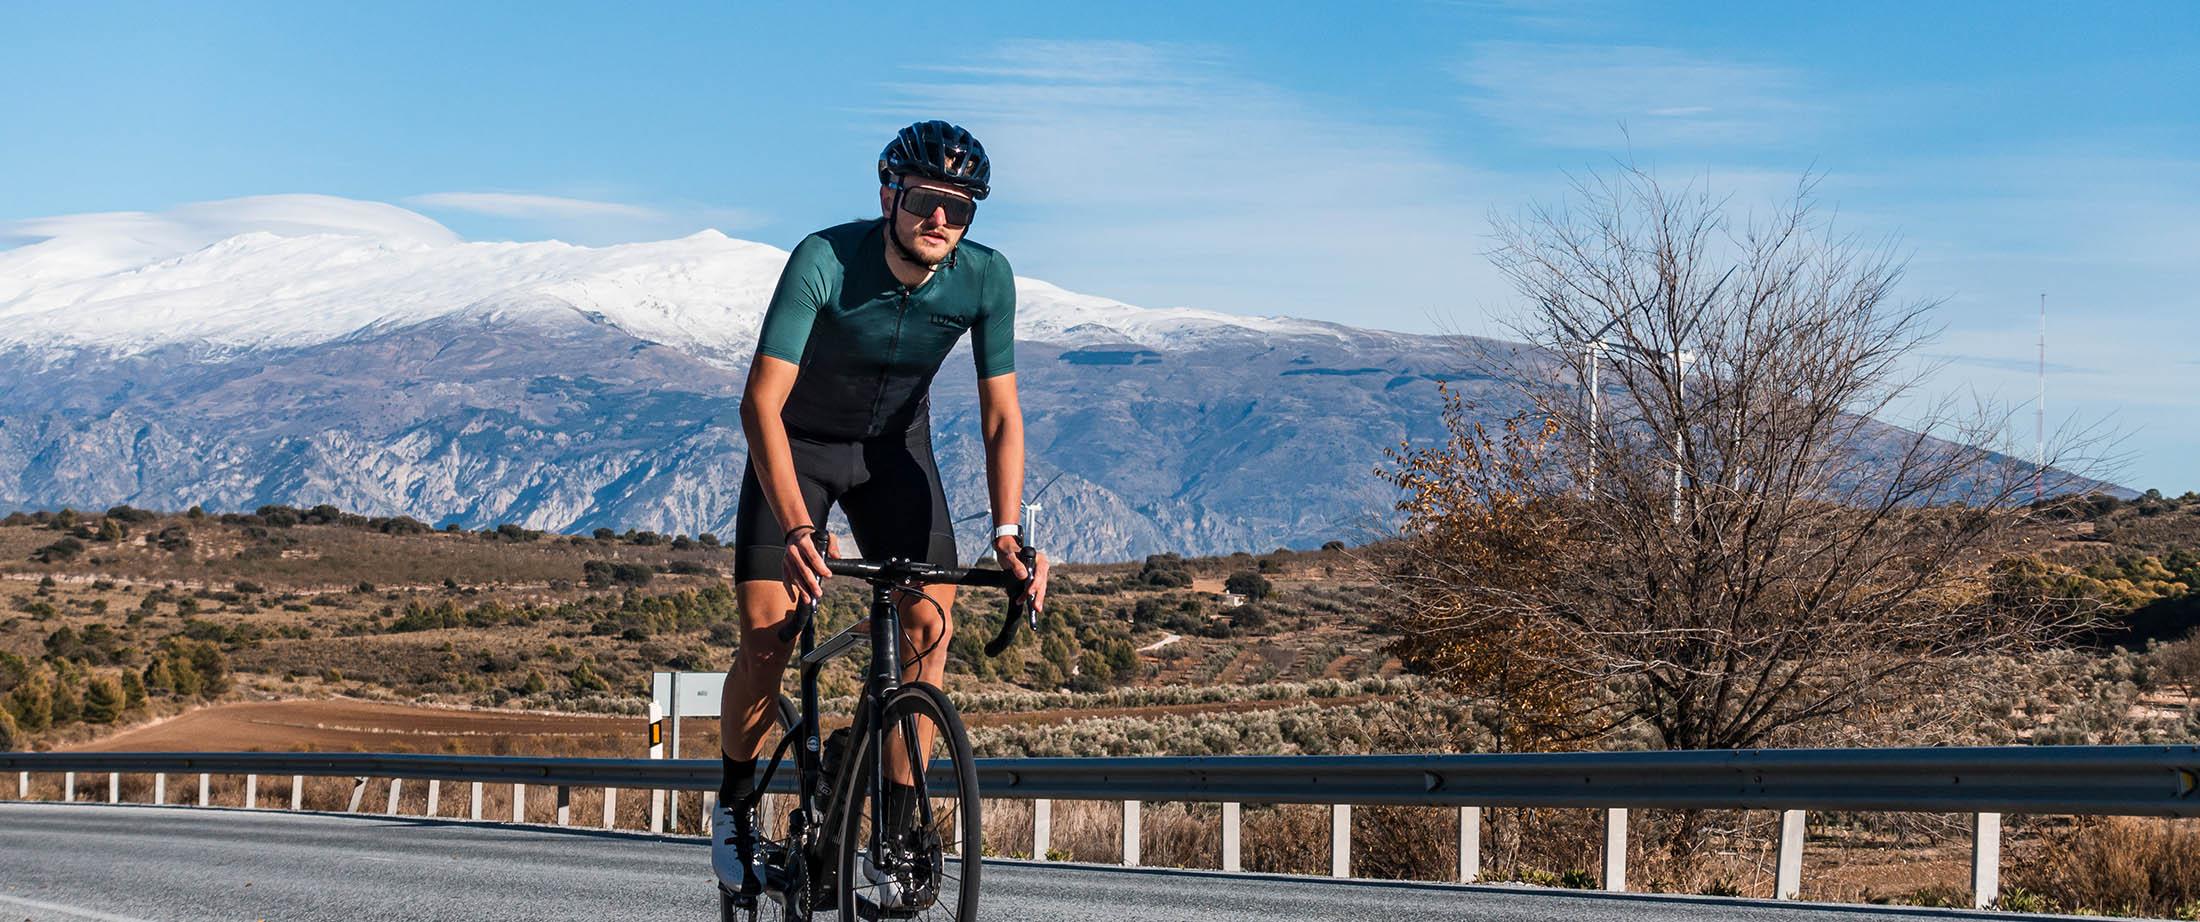 Match with black bib shorts or deep green cycling socks.